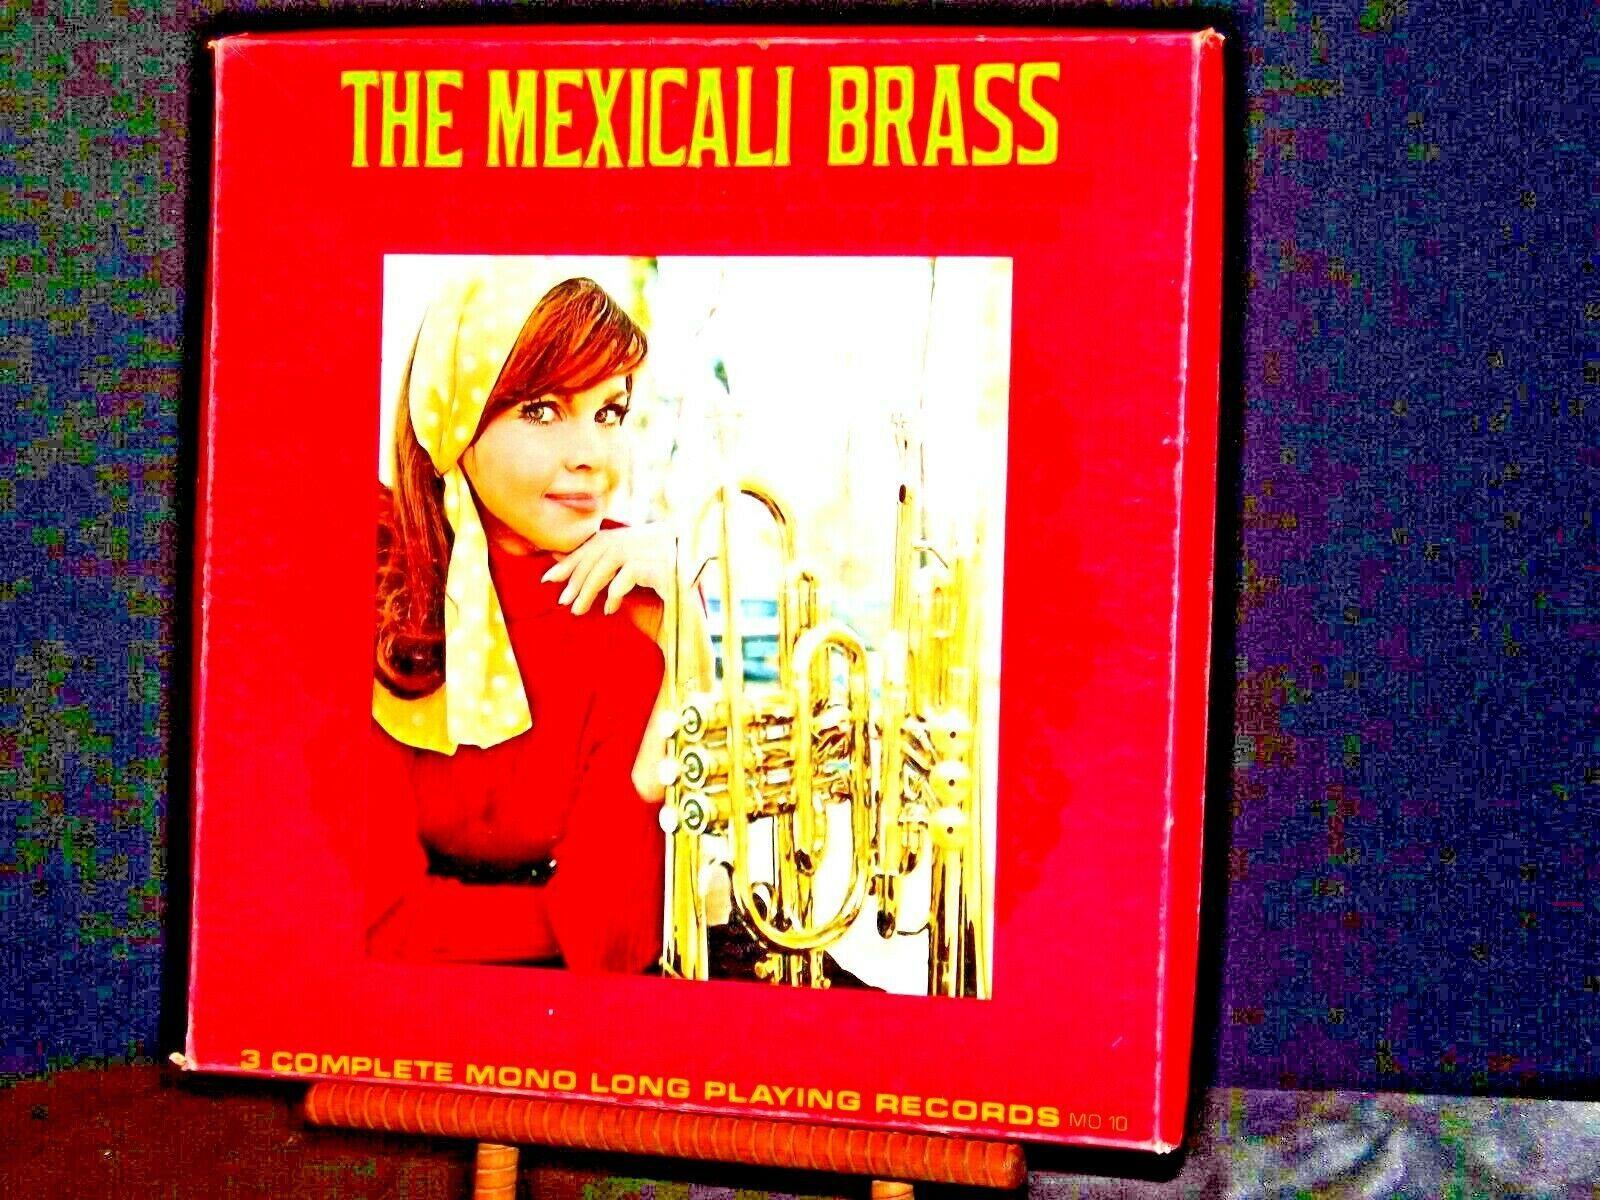 ARA The Mexicali Brass. Three complete mono long-playing record AA19-1501 Antiq